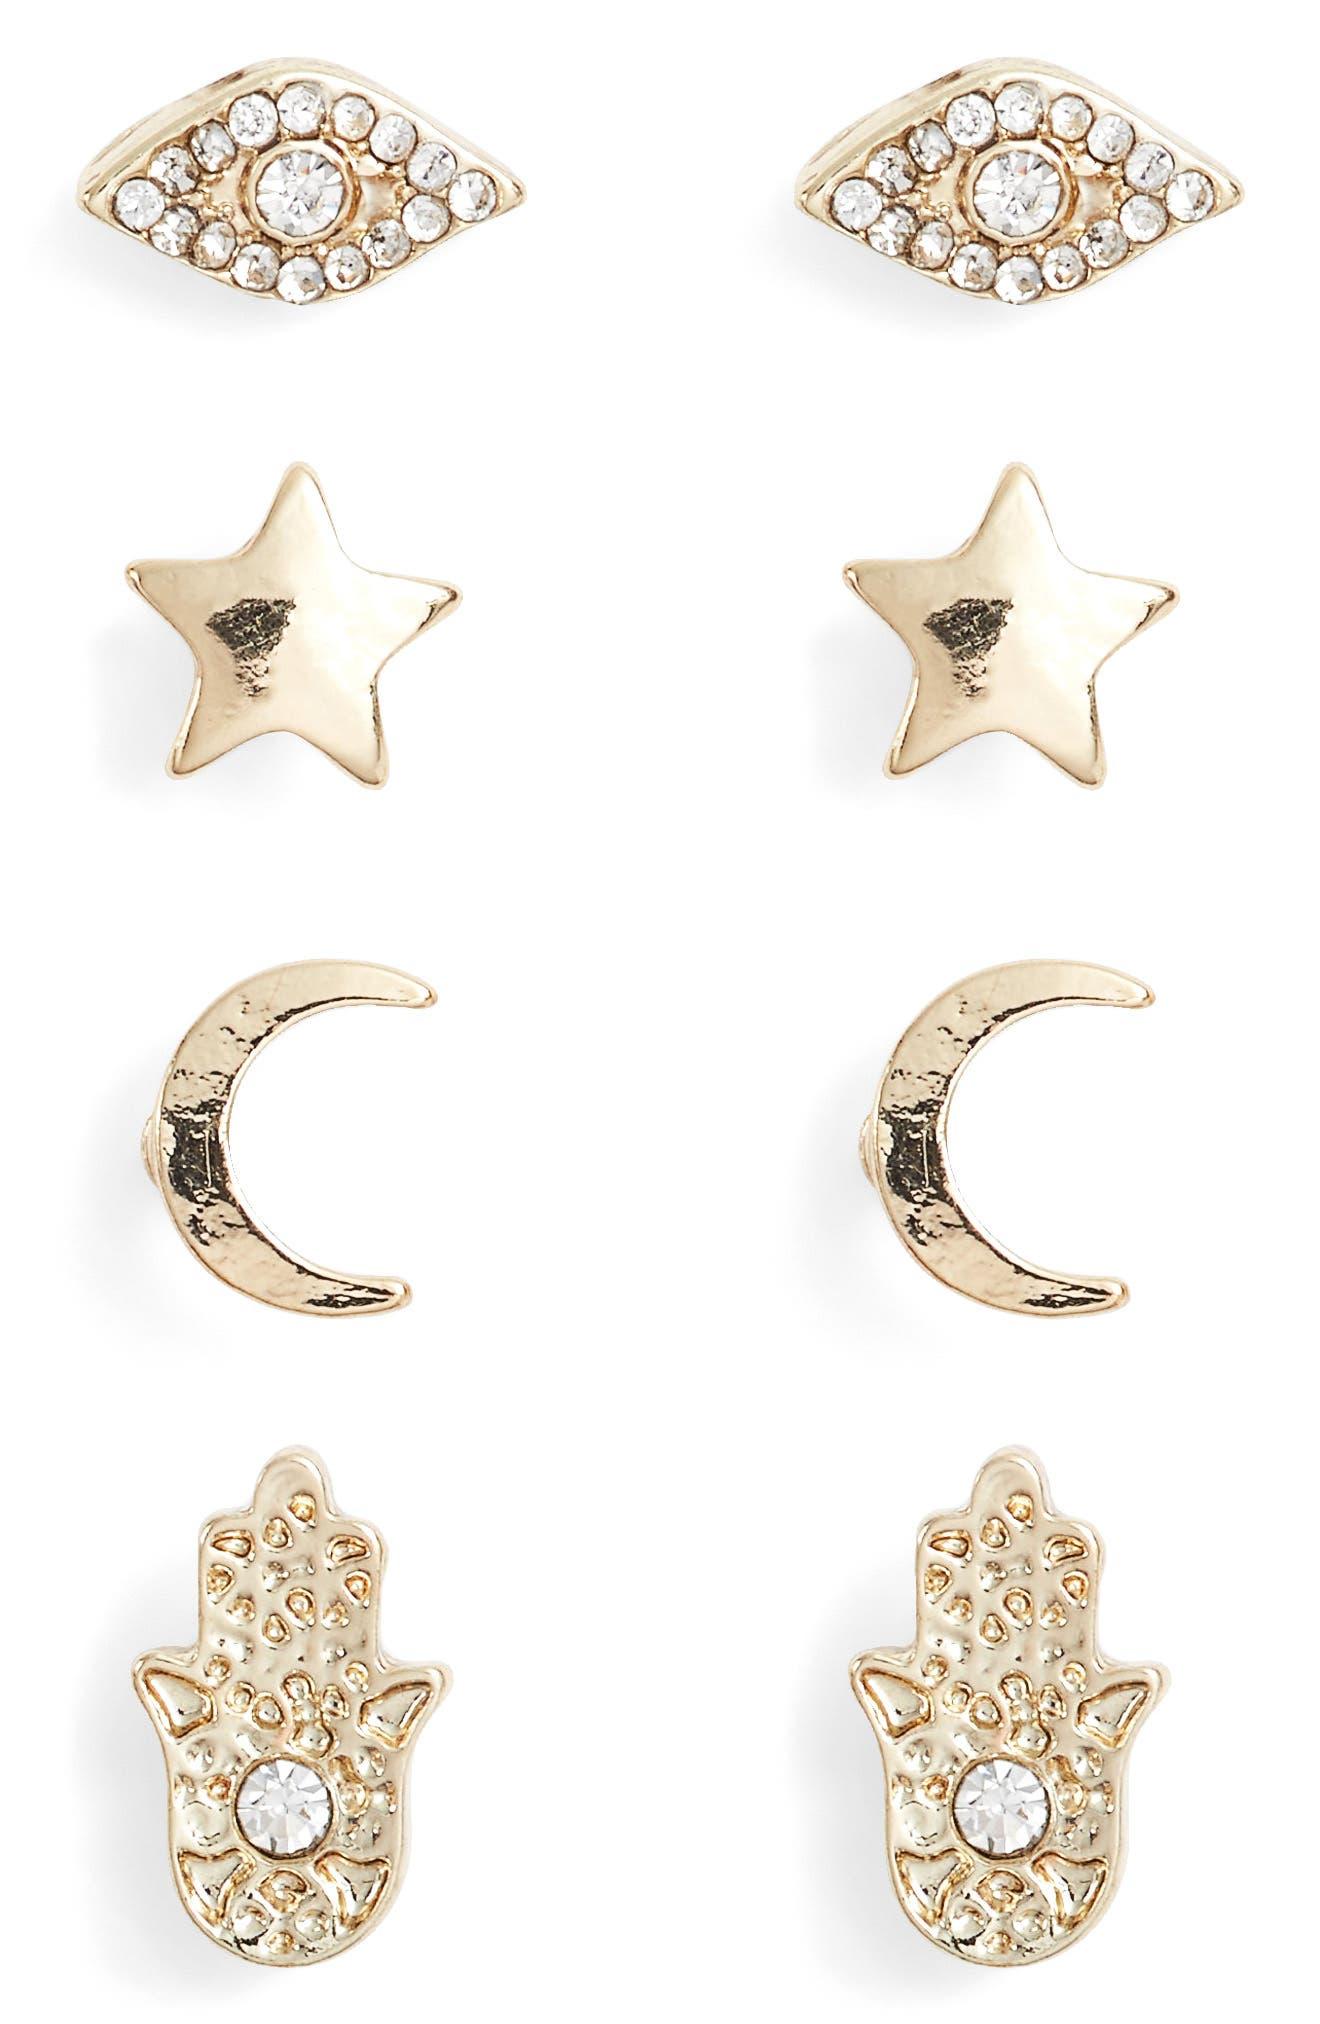 Alternate Image 1 Selected - Ettika Set of 4 Stud Earrings